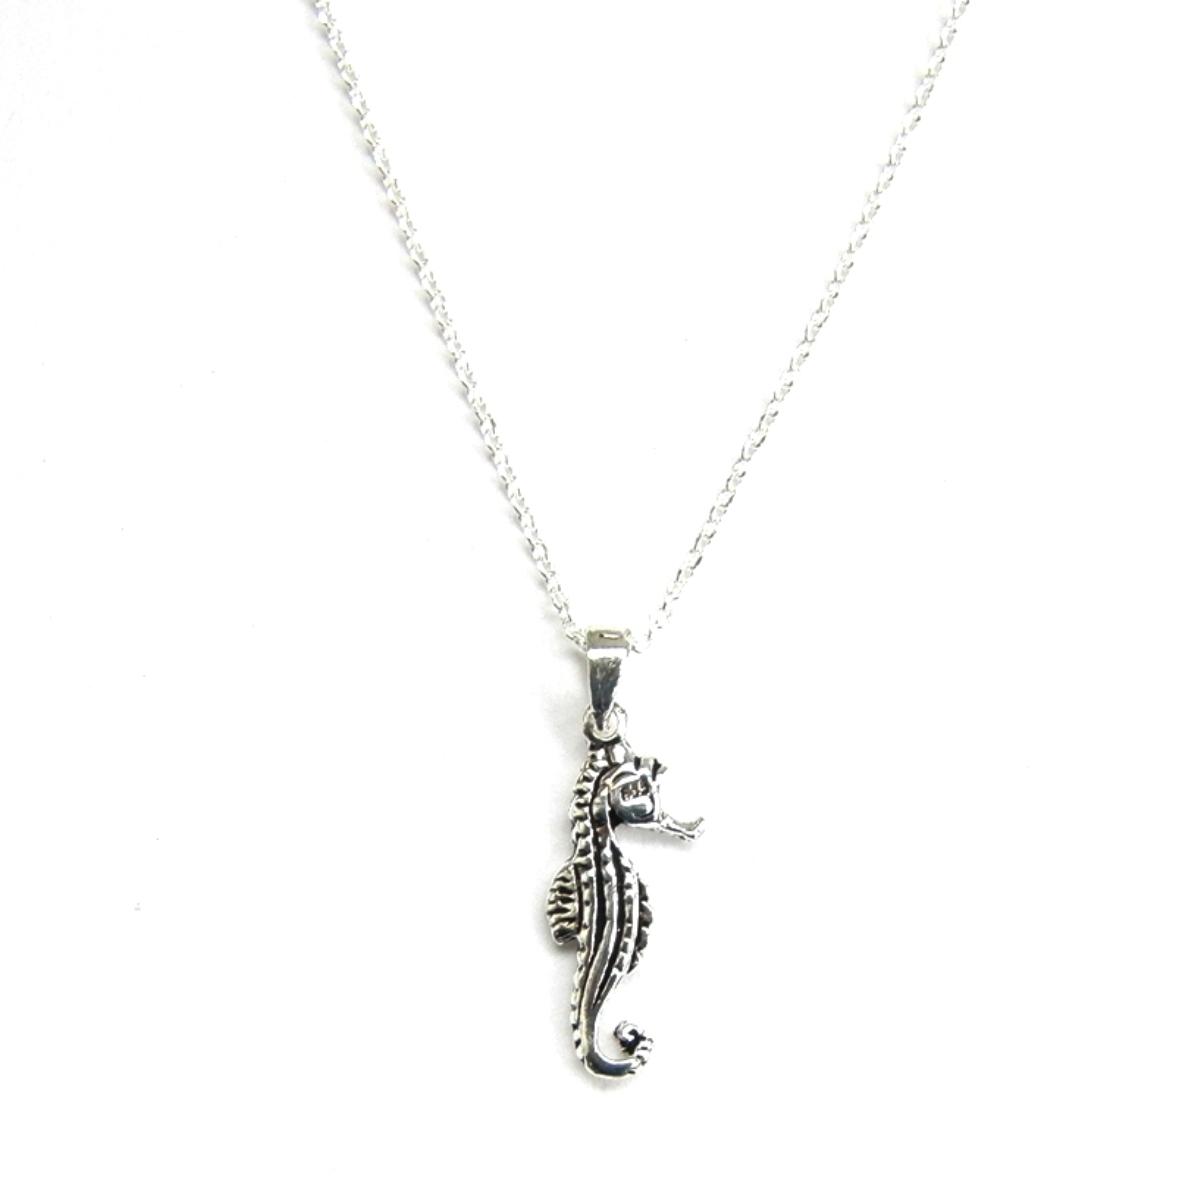 Child's Seahorse Necklace.